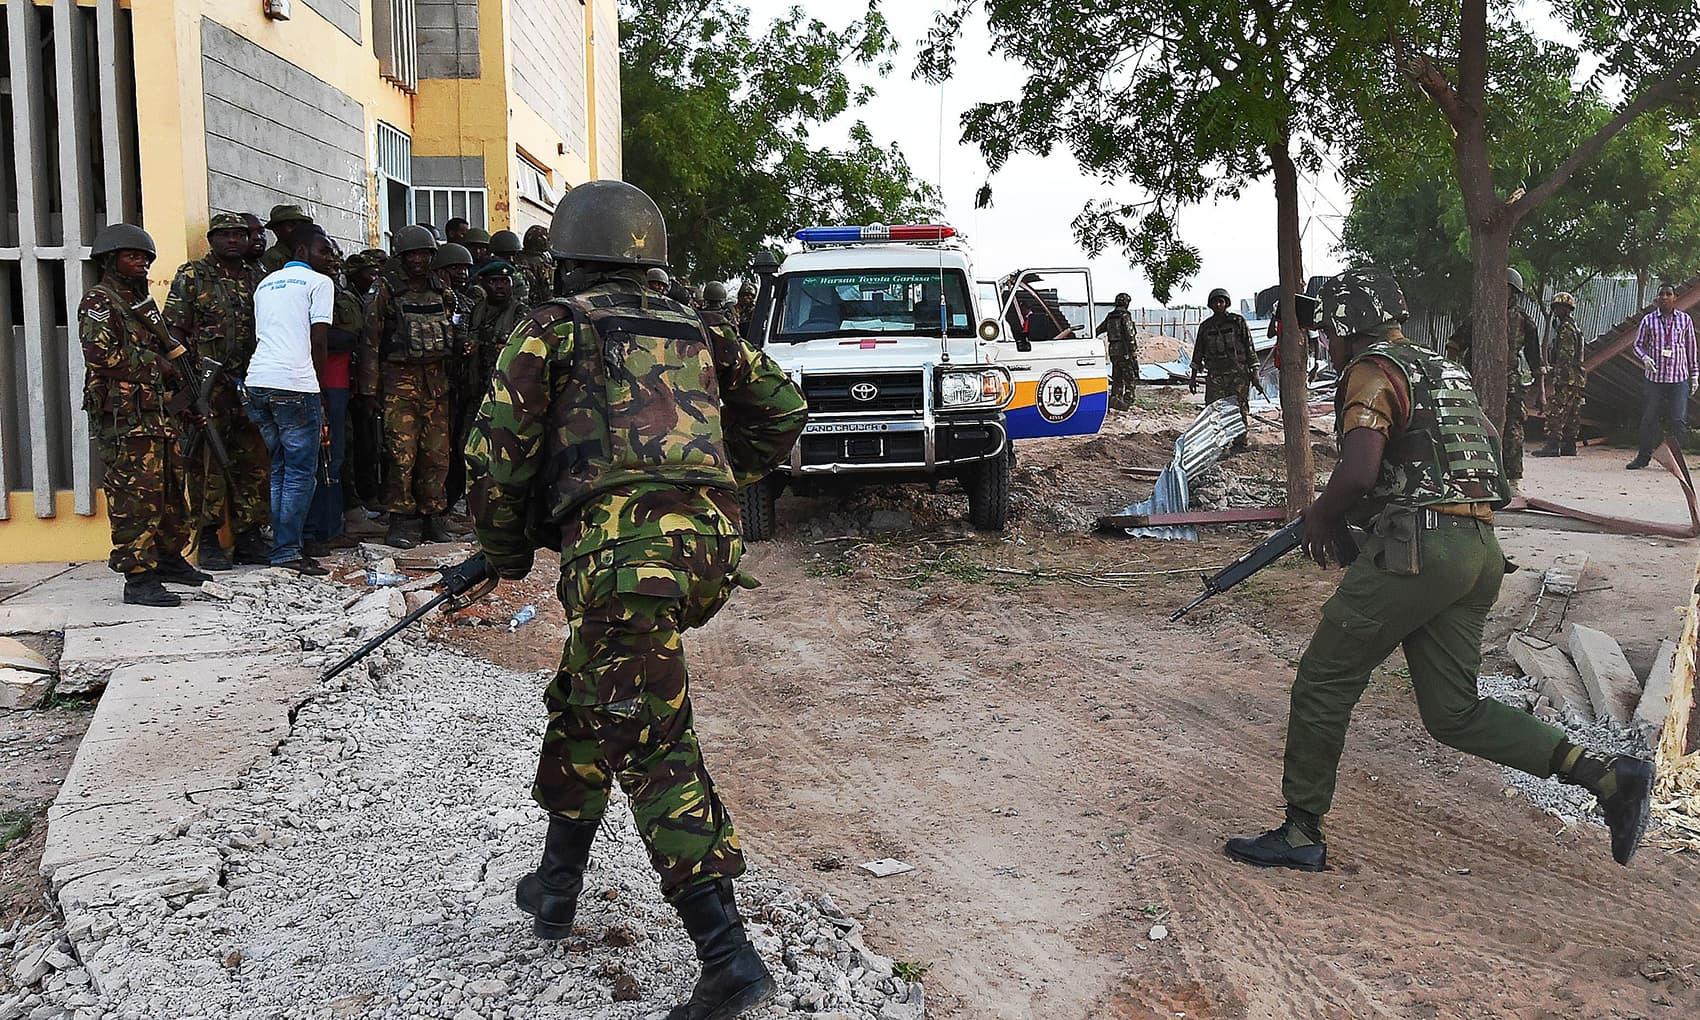 Kenyan Defence Forces run towards the Garissa University campus after an attack by Somalia's Al-Qaeda-linked Shebab gunmen. -AFP